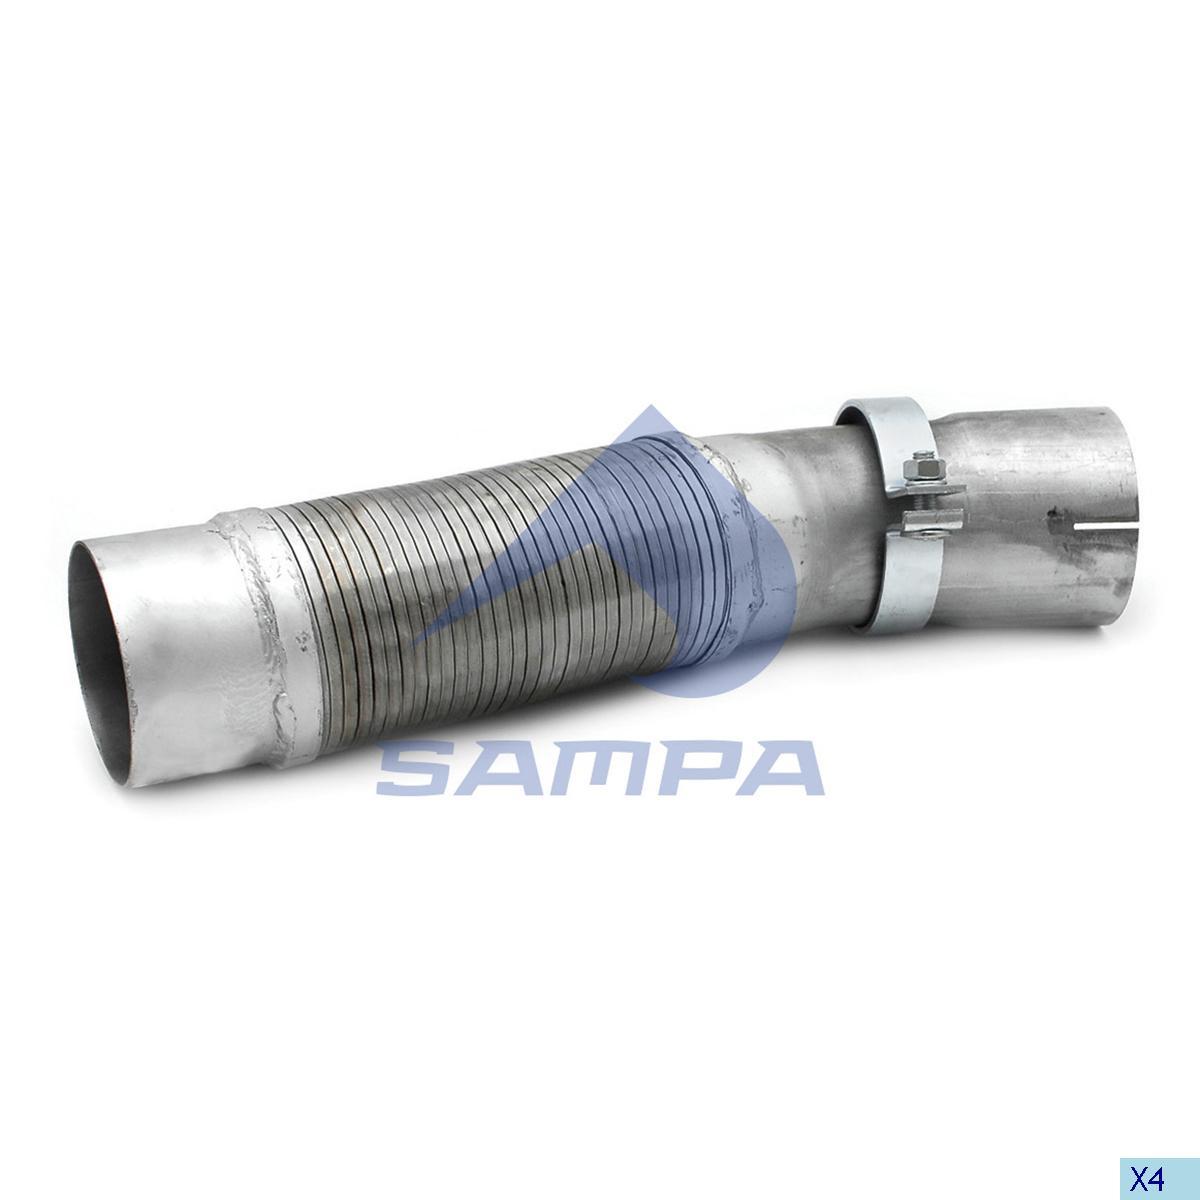 Flexible Pipe, Exhaust, Mercedes, Engine